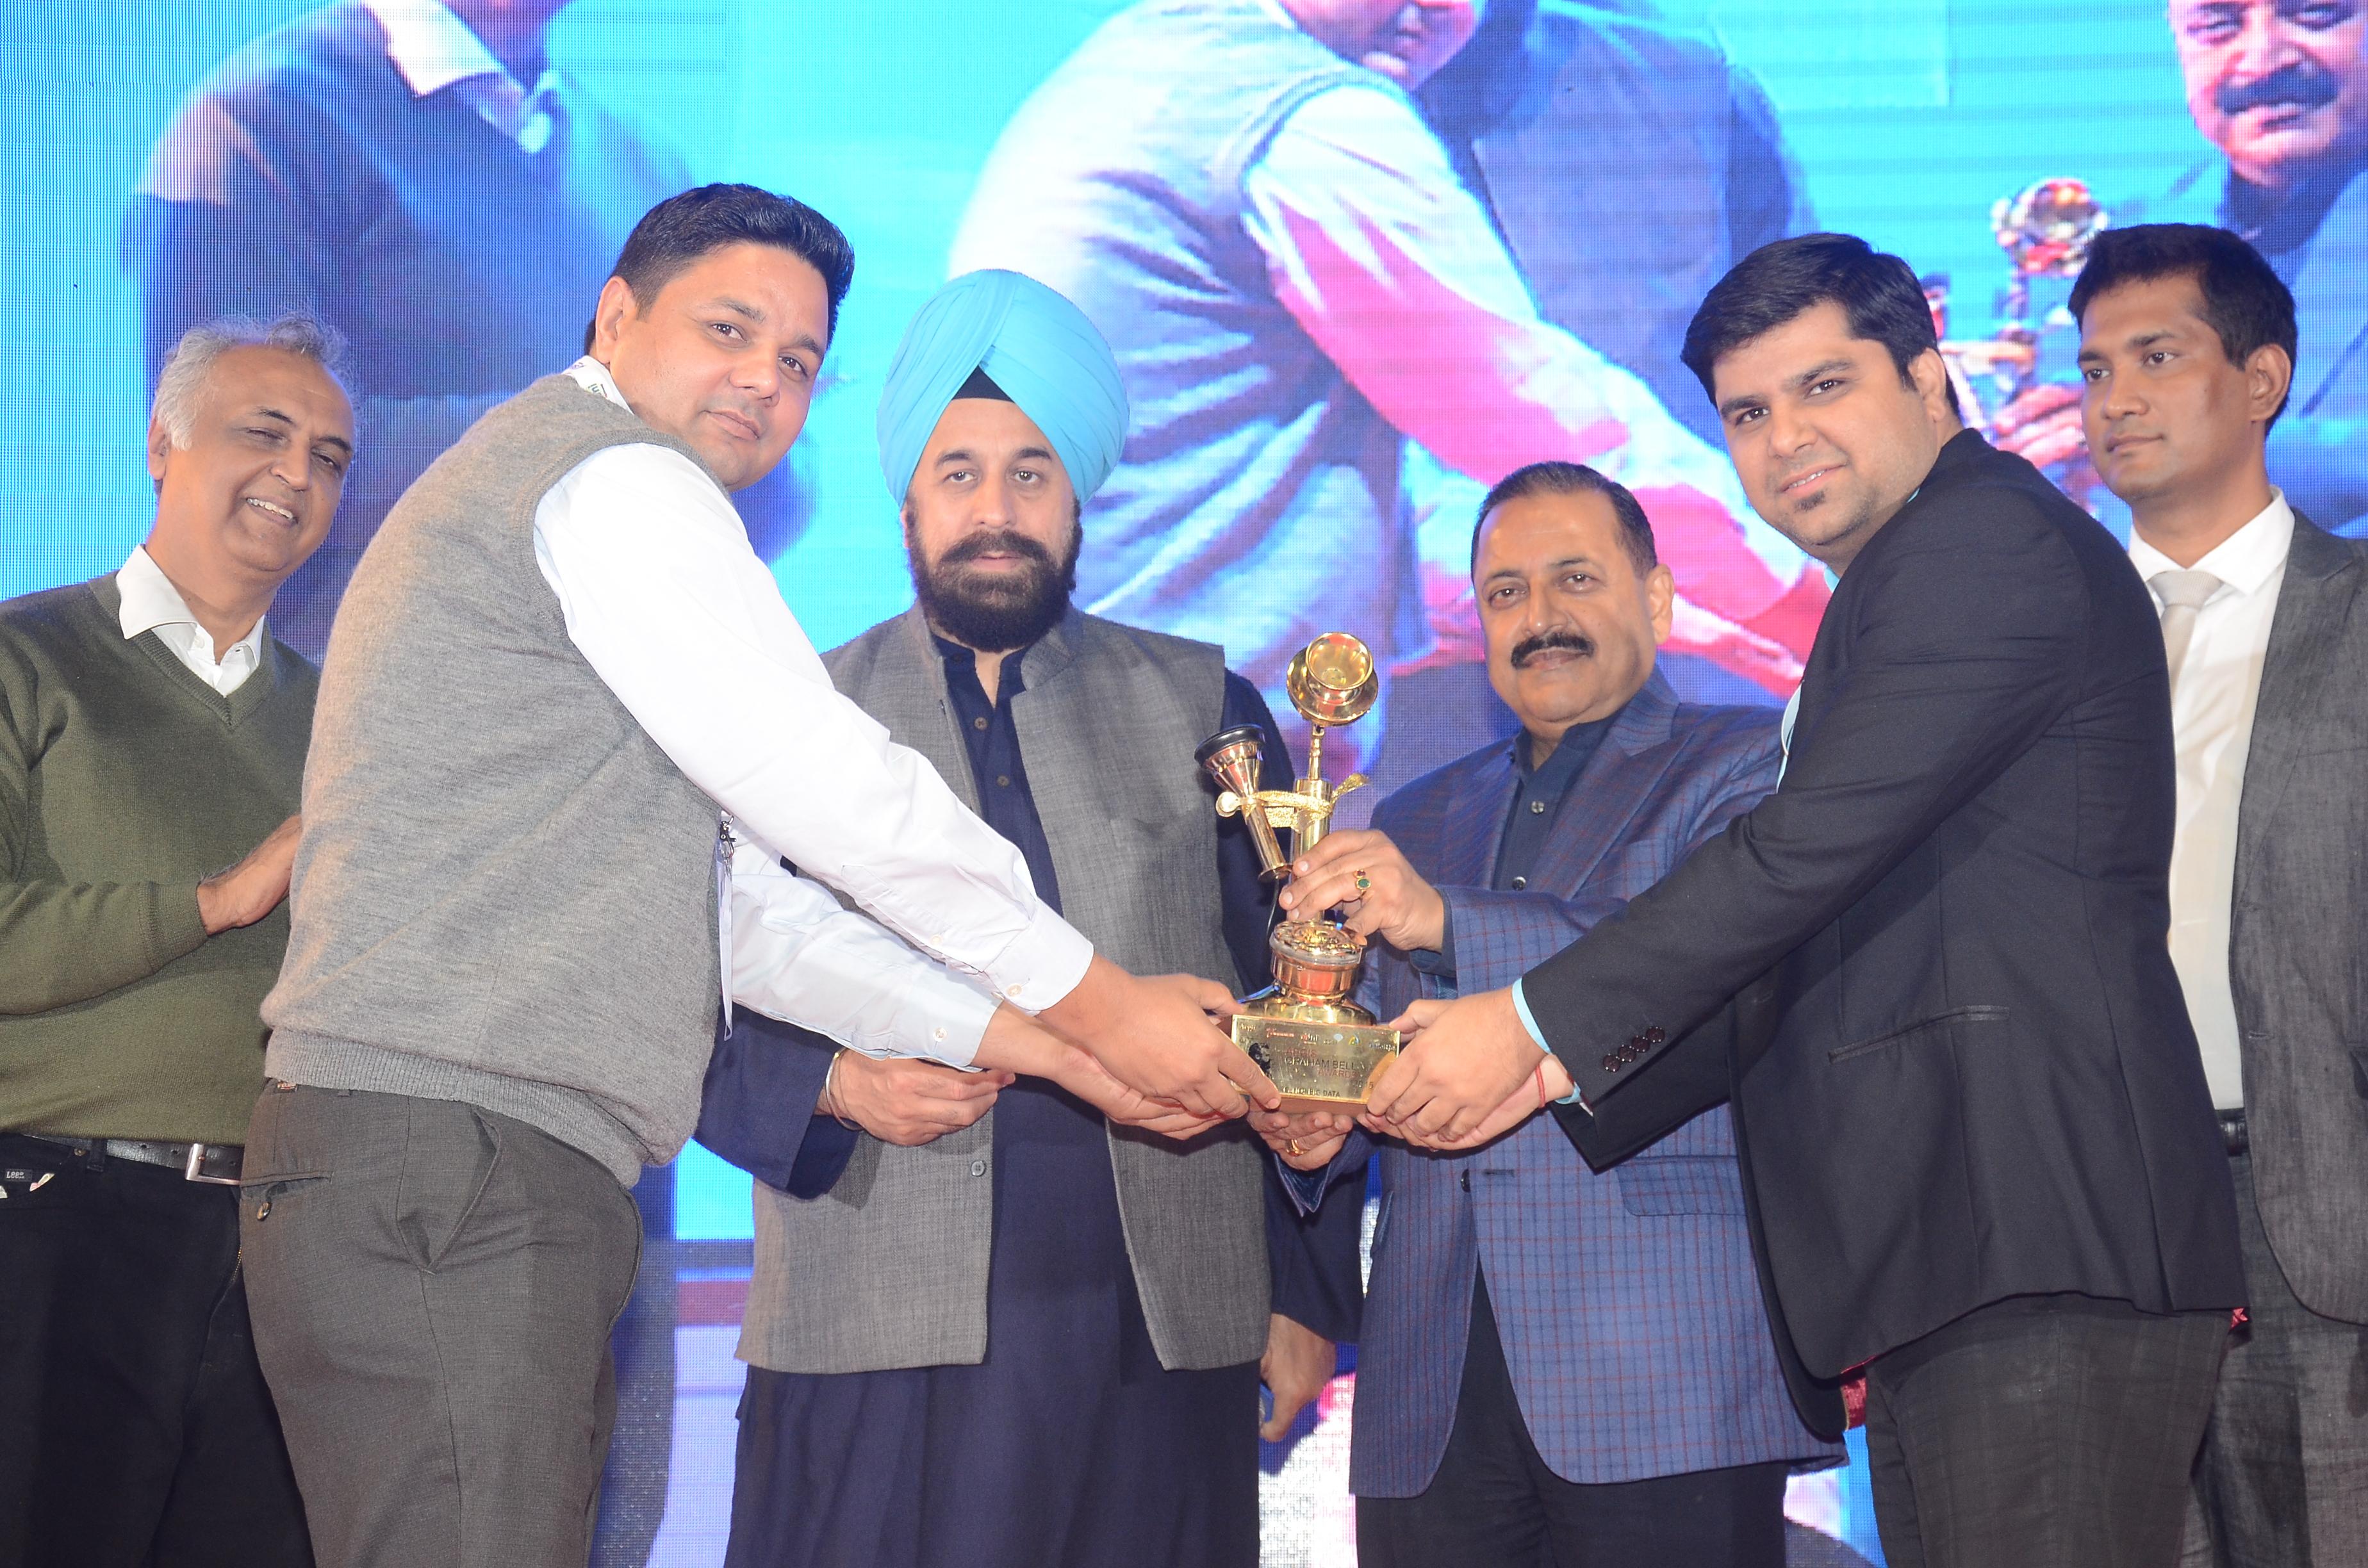 Cloud4C - Cloud winner 2015